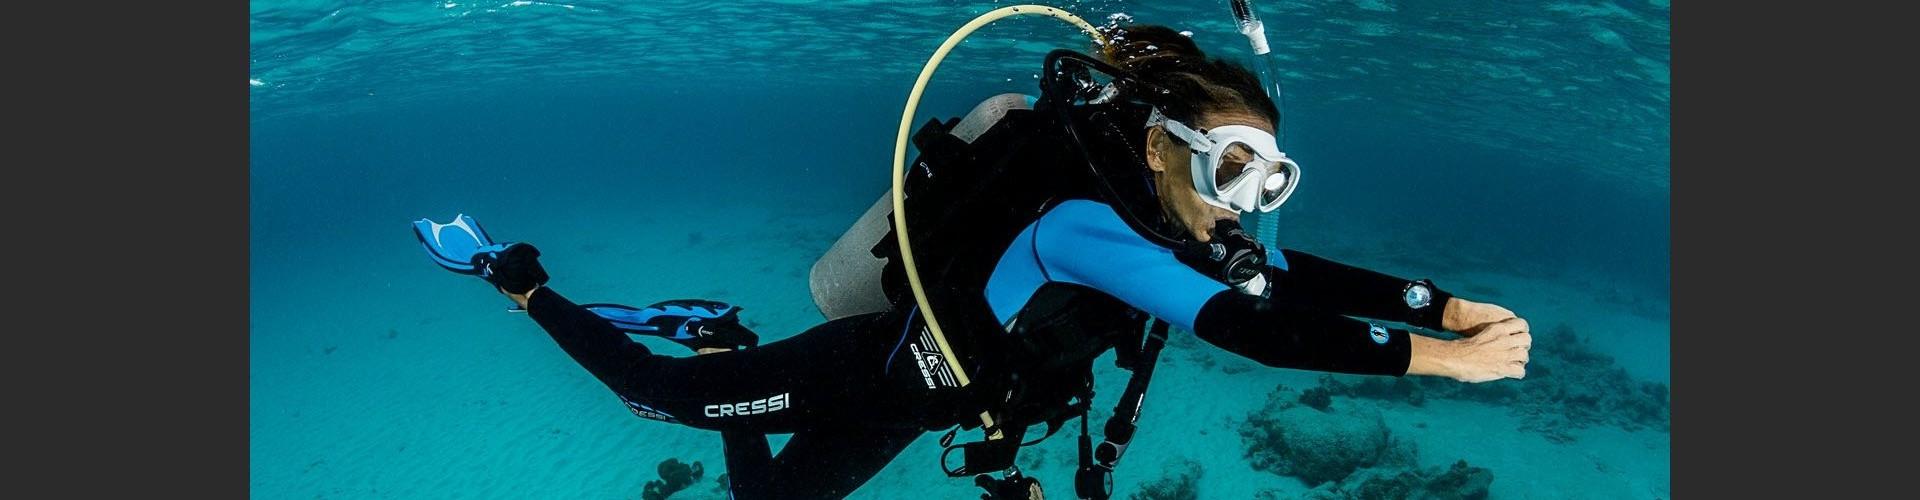 Cressi Diving